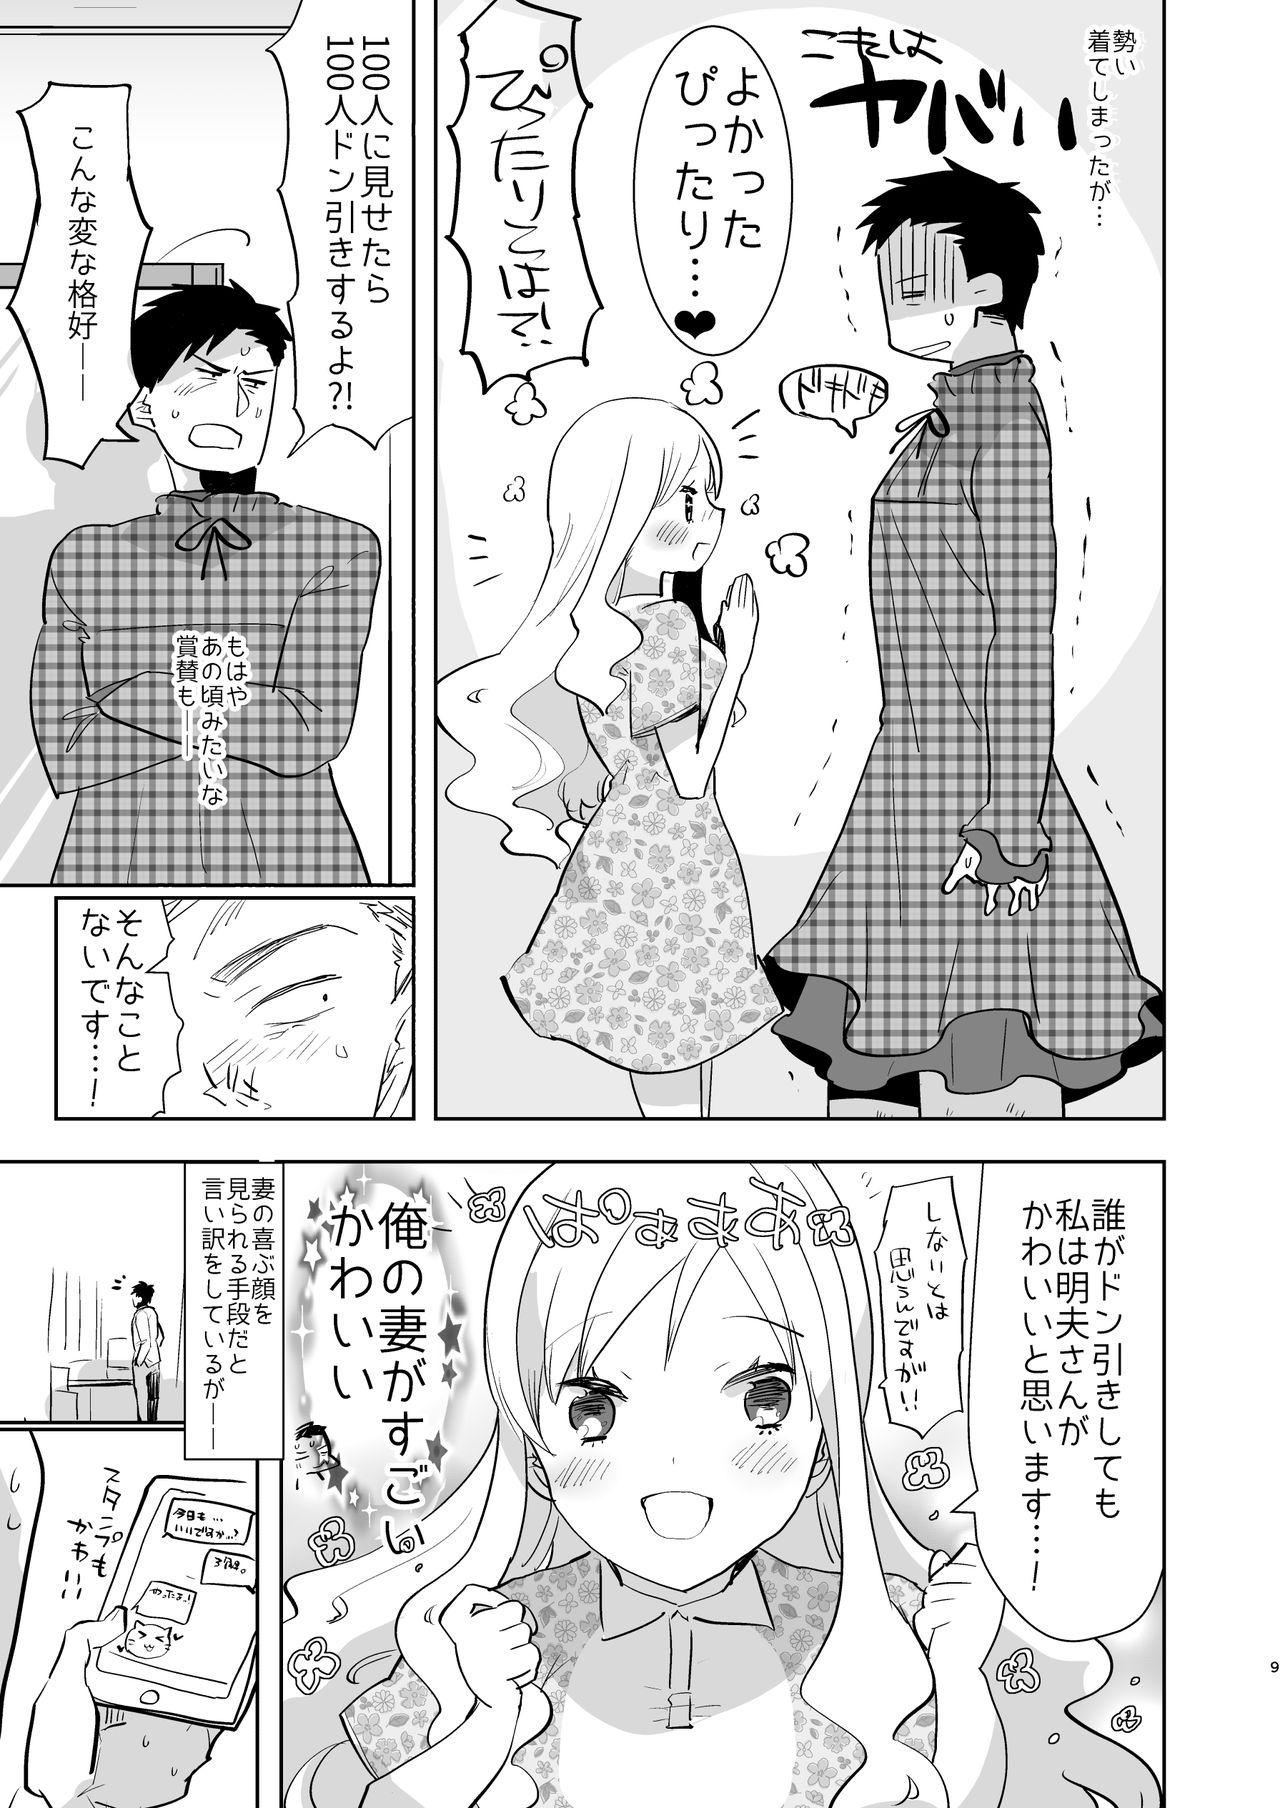 [Aimaitei (Aimaitei Umami)] Otto wa Shimakaze-kun 30-sai [Digital] 8